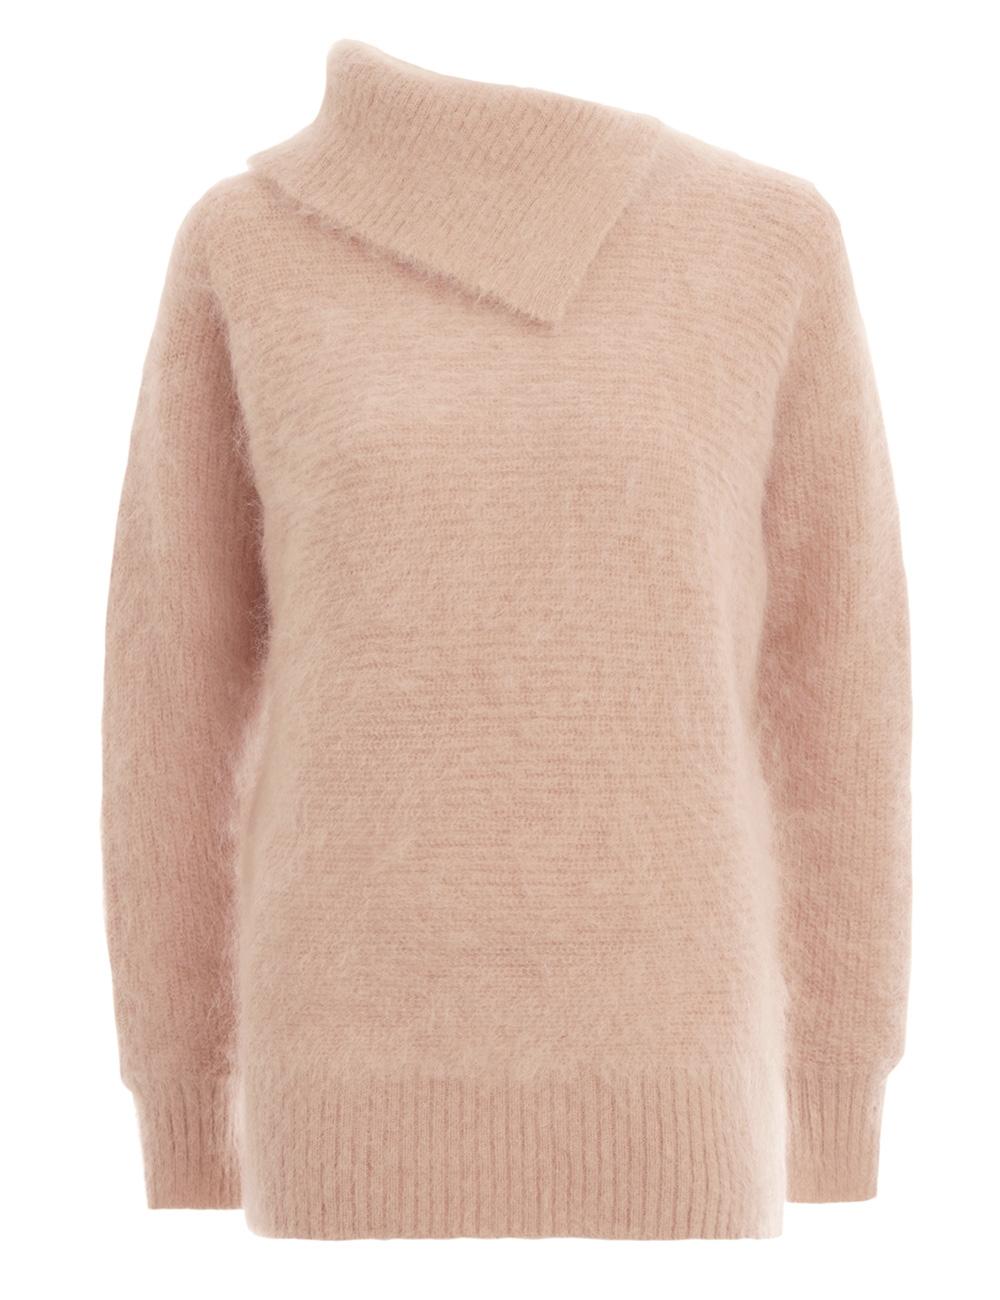 Espionage Roll Collar Sweater